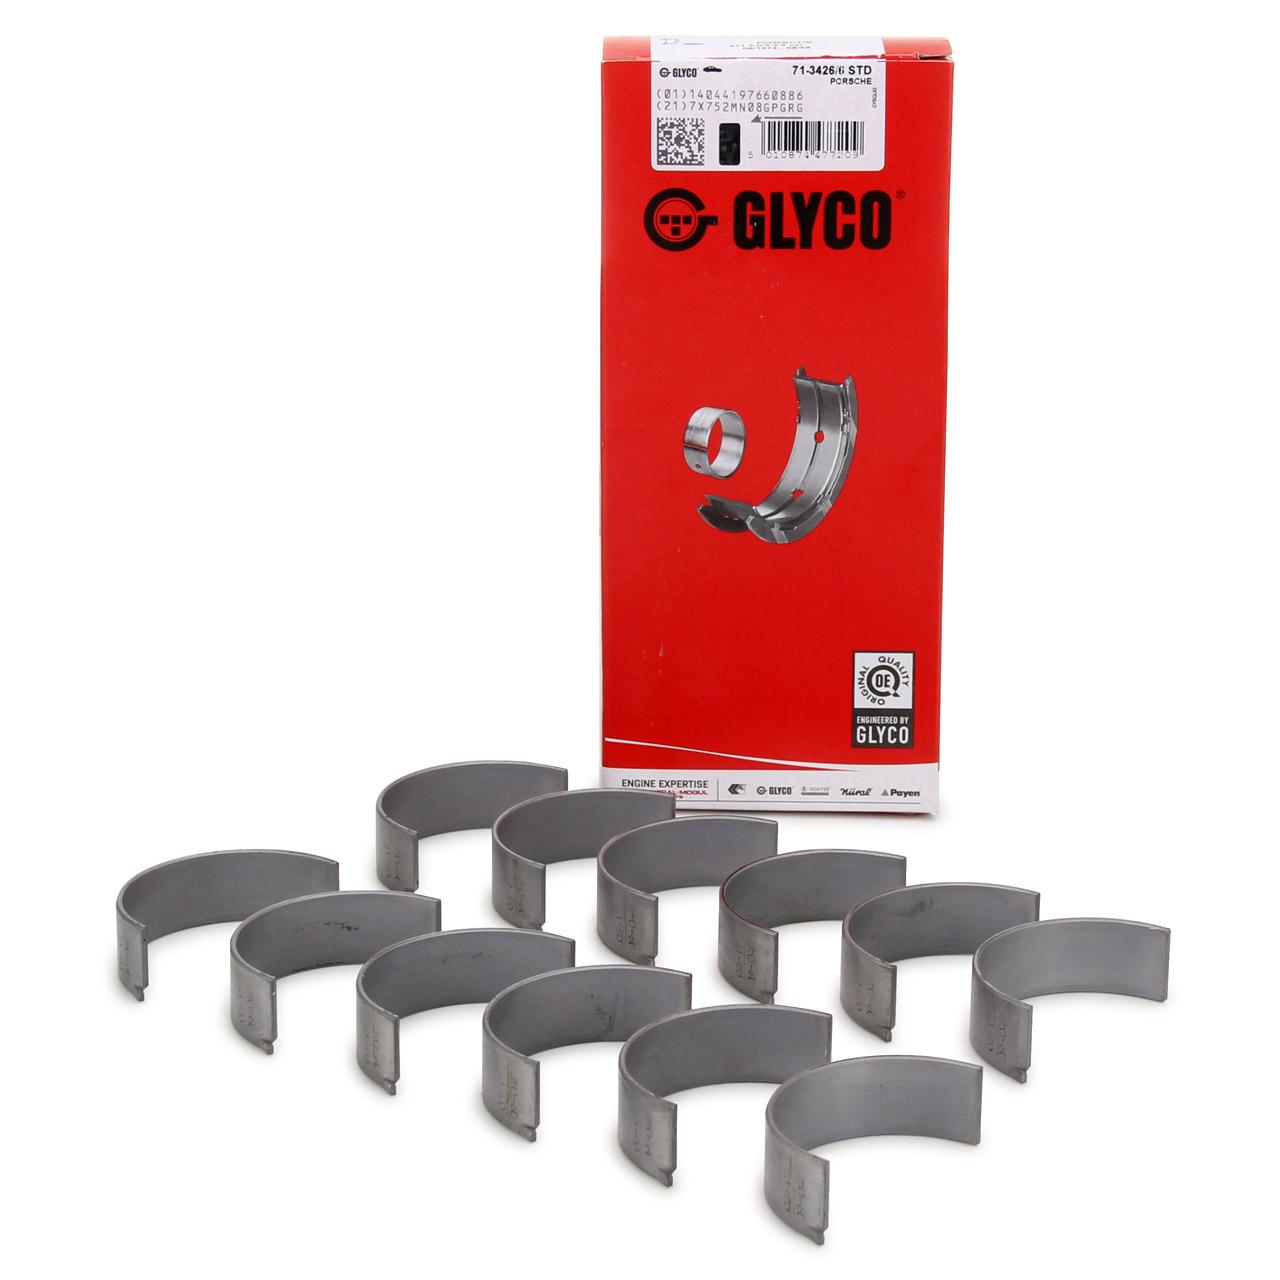 GLYCO 71-3426/6 STD Pleuellager Satz PORSCHE 911 3.0 SC + SC Carrera 1977-1983